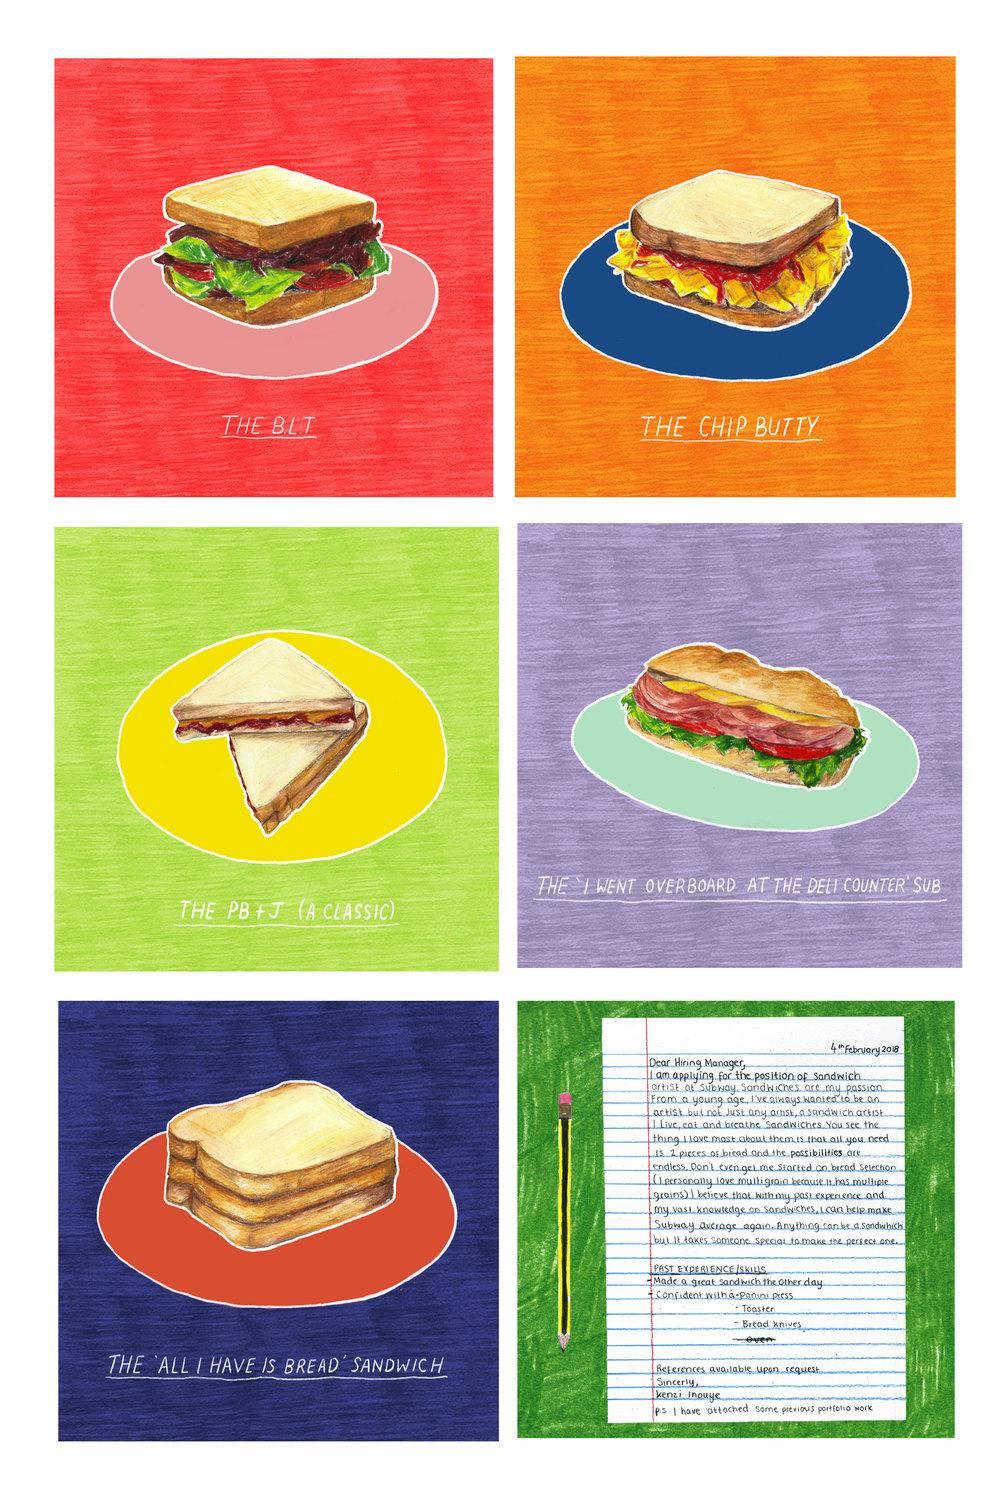 Sandwich Artist application for Subway